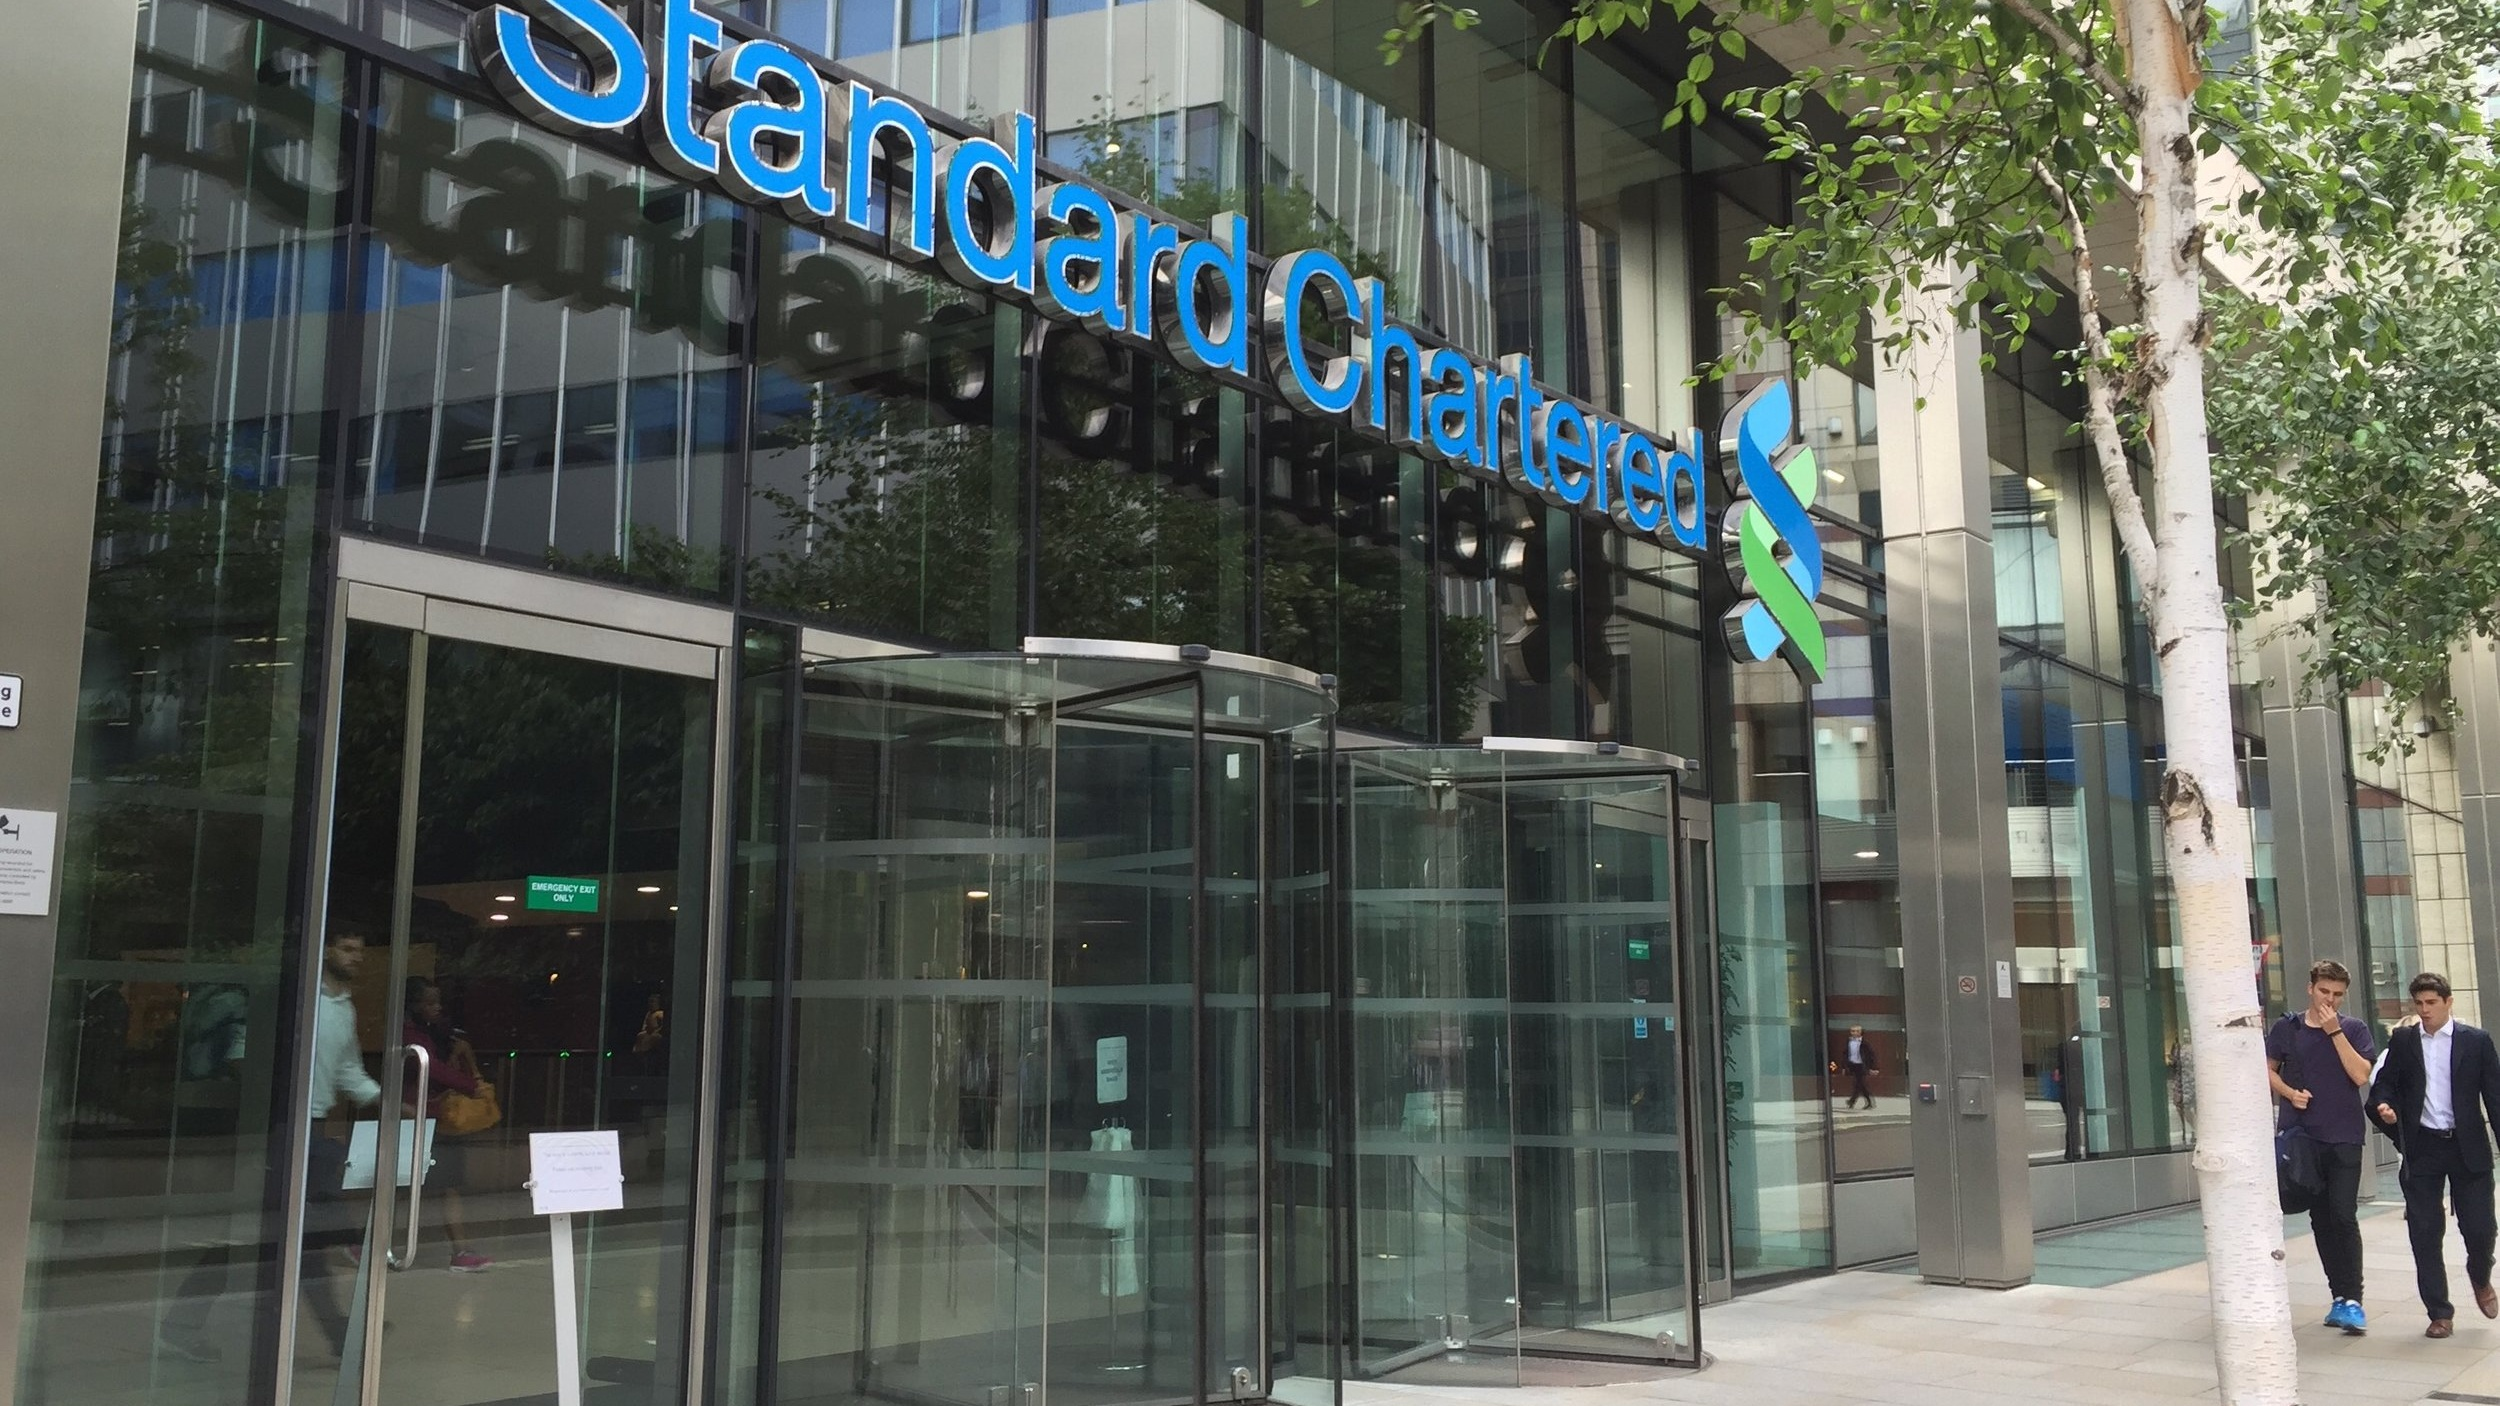 Standard_Chartered_Bank.jpg